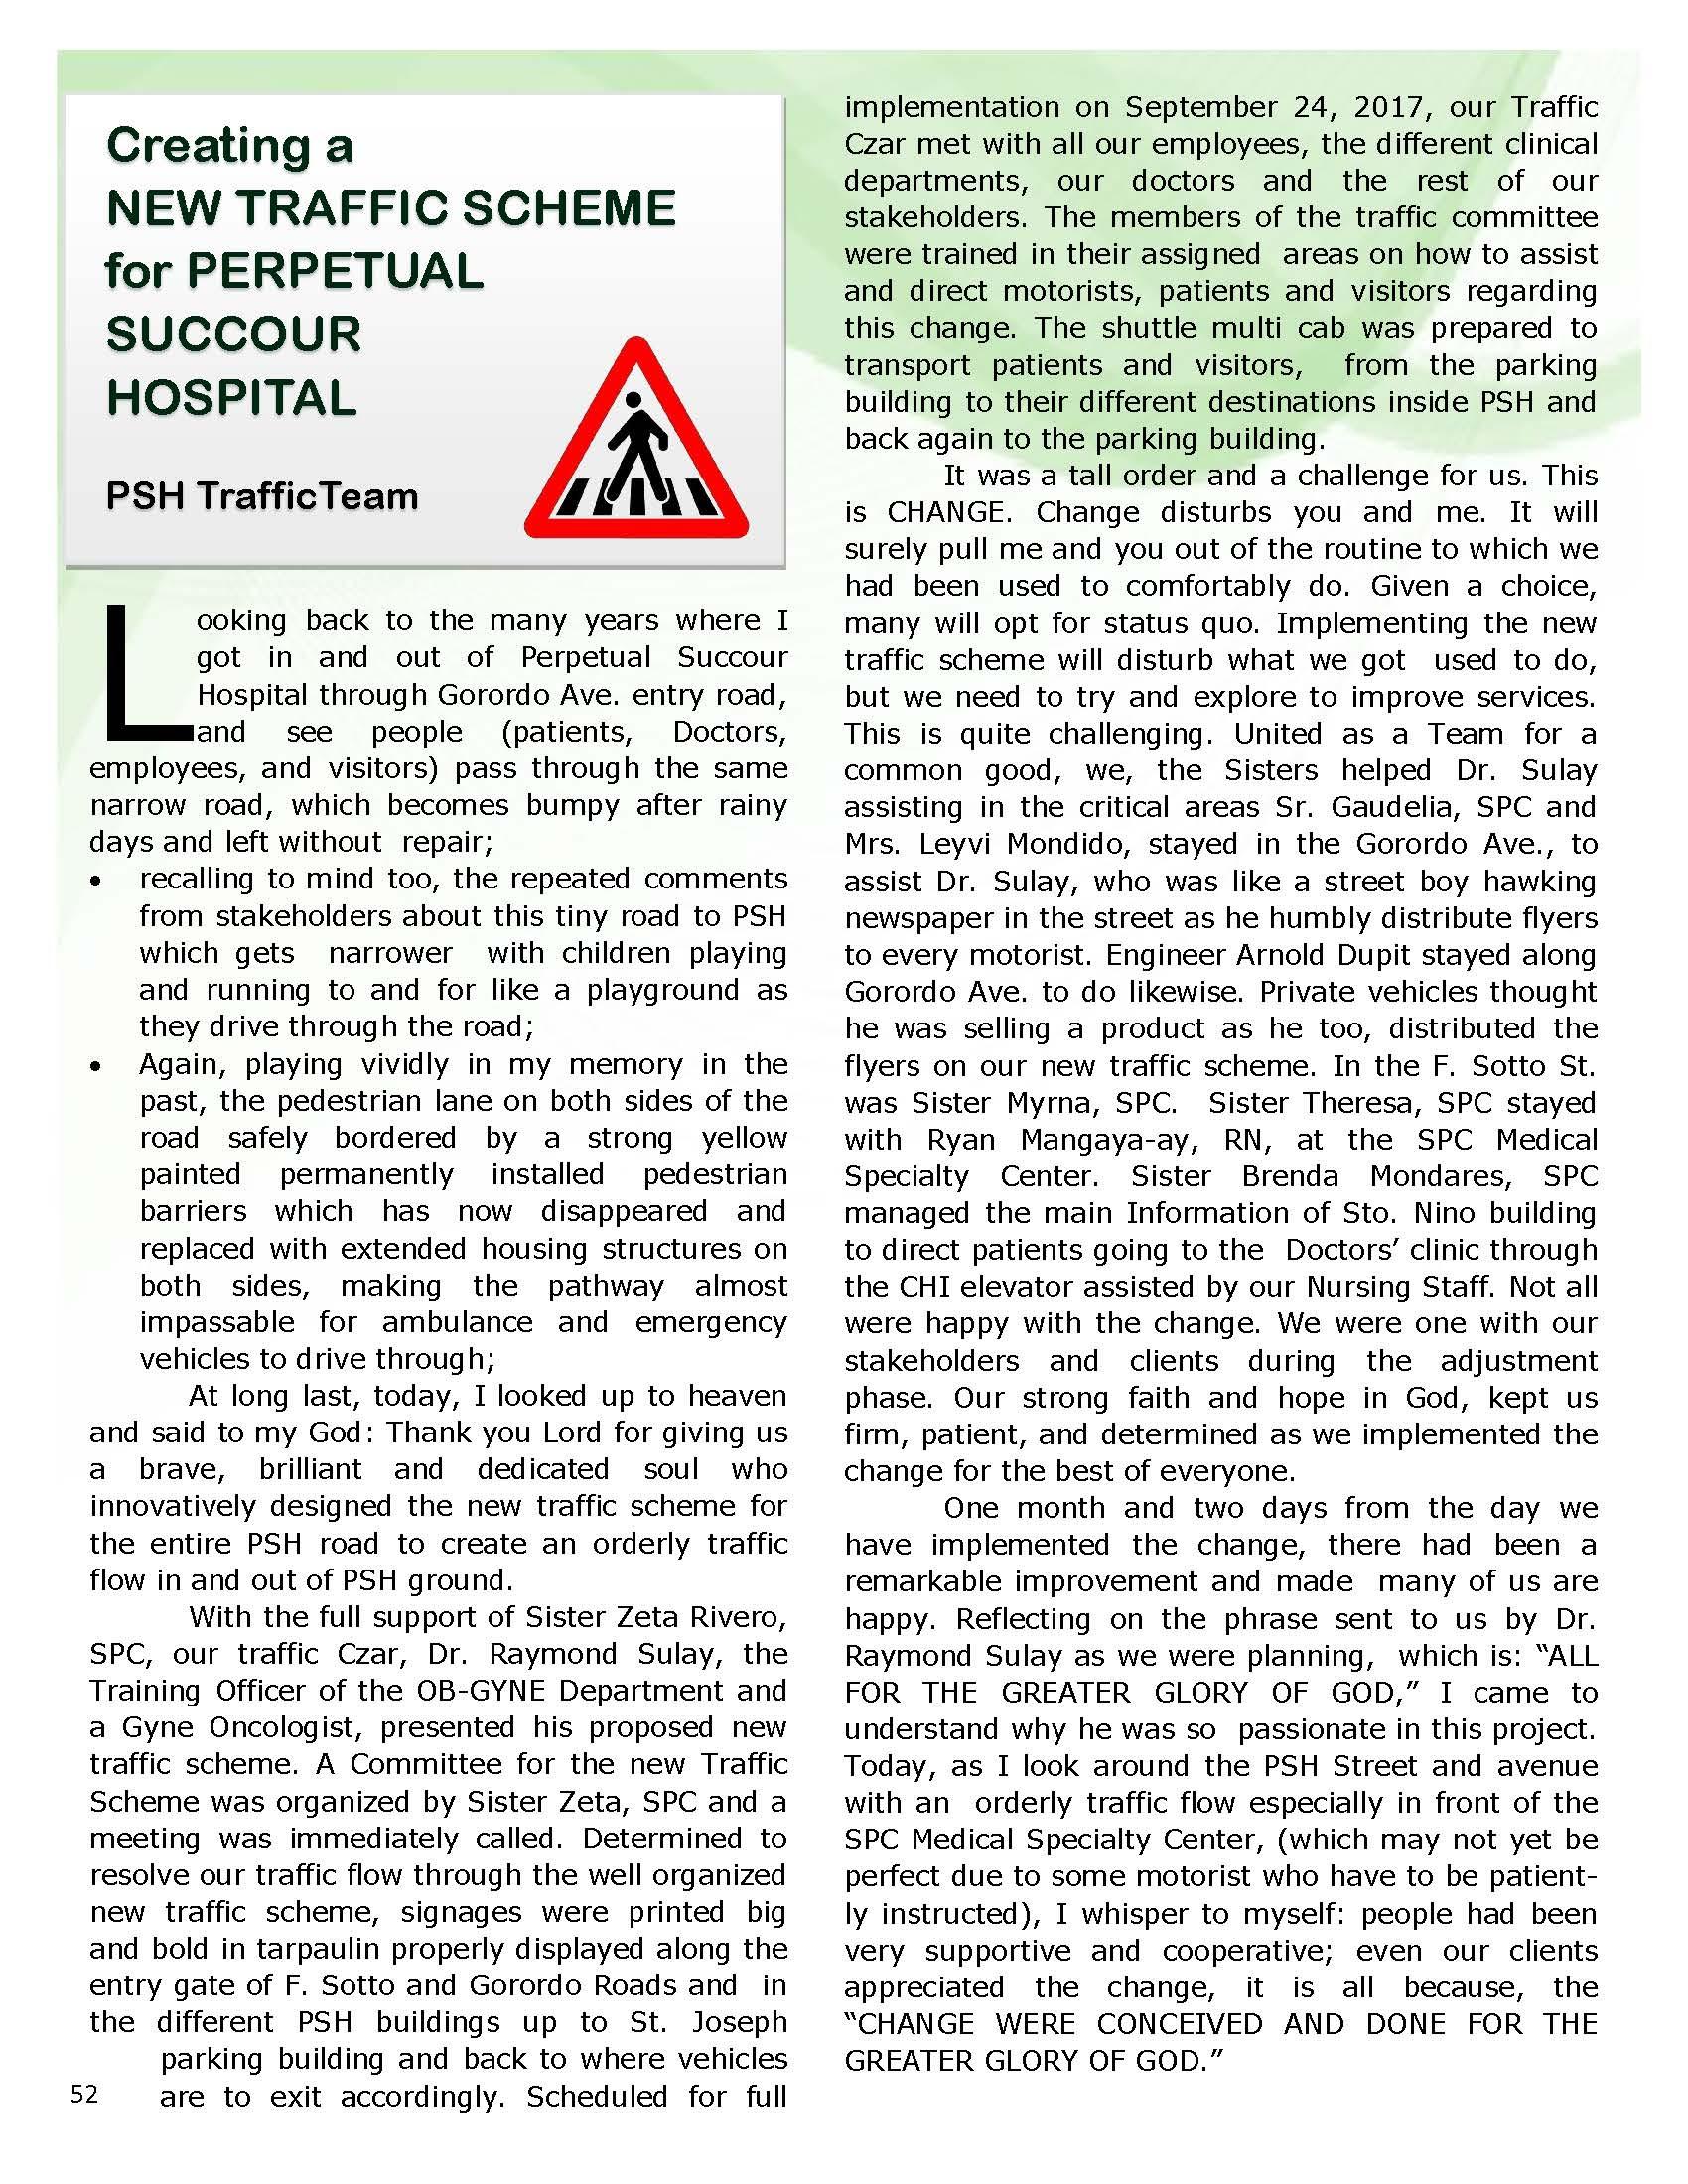 FINAL_TRAILBLAZER_volume 3_part1.pub2.pub_December5a_Page_57